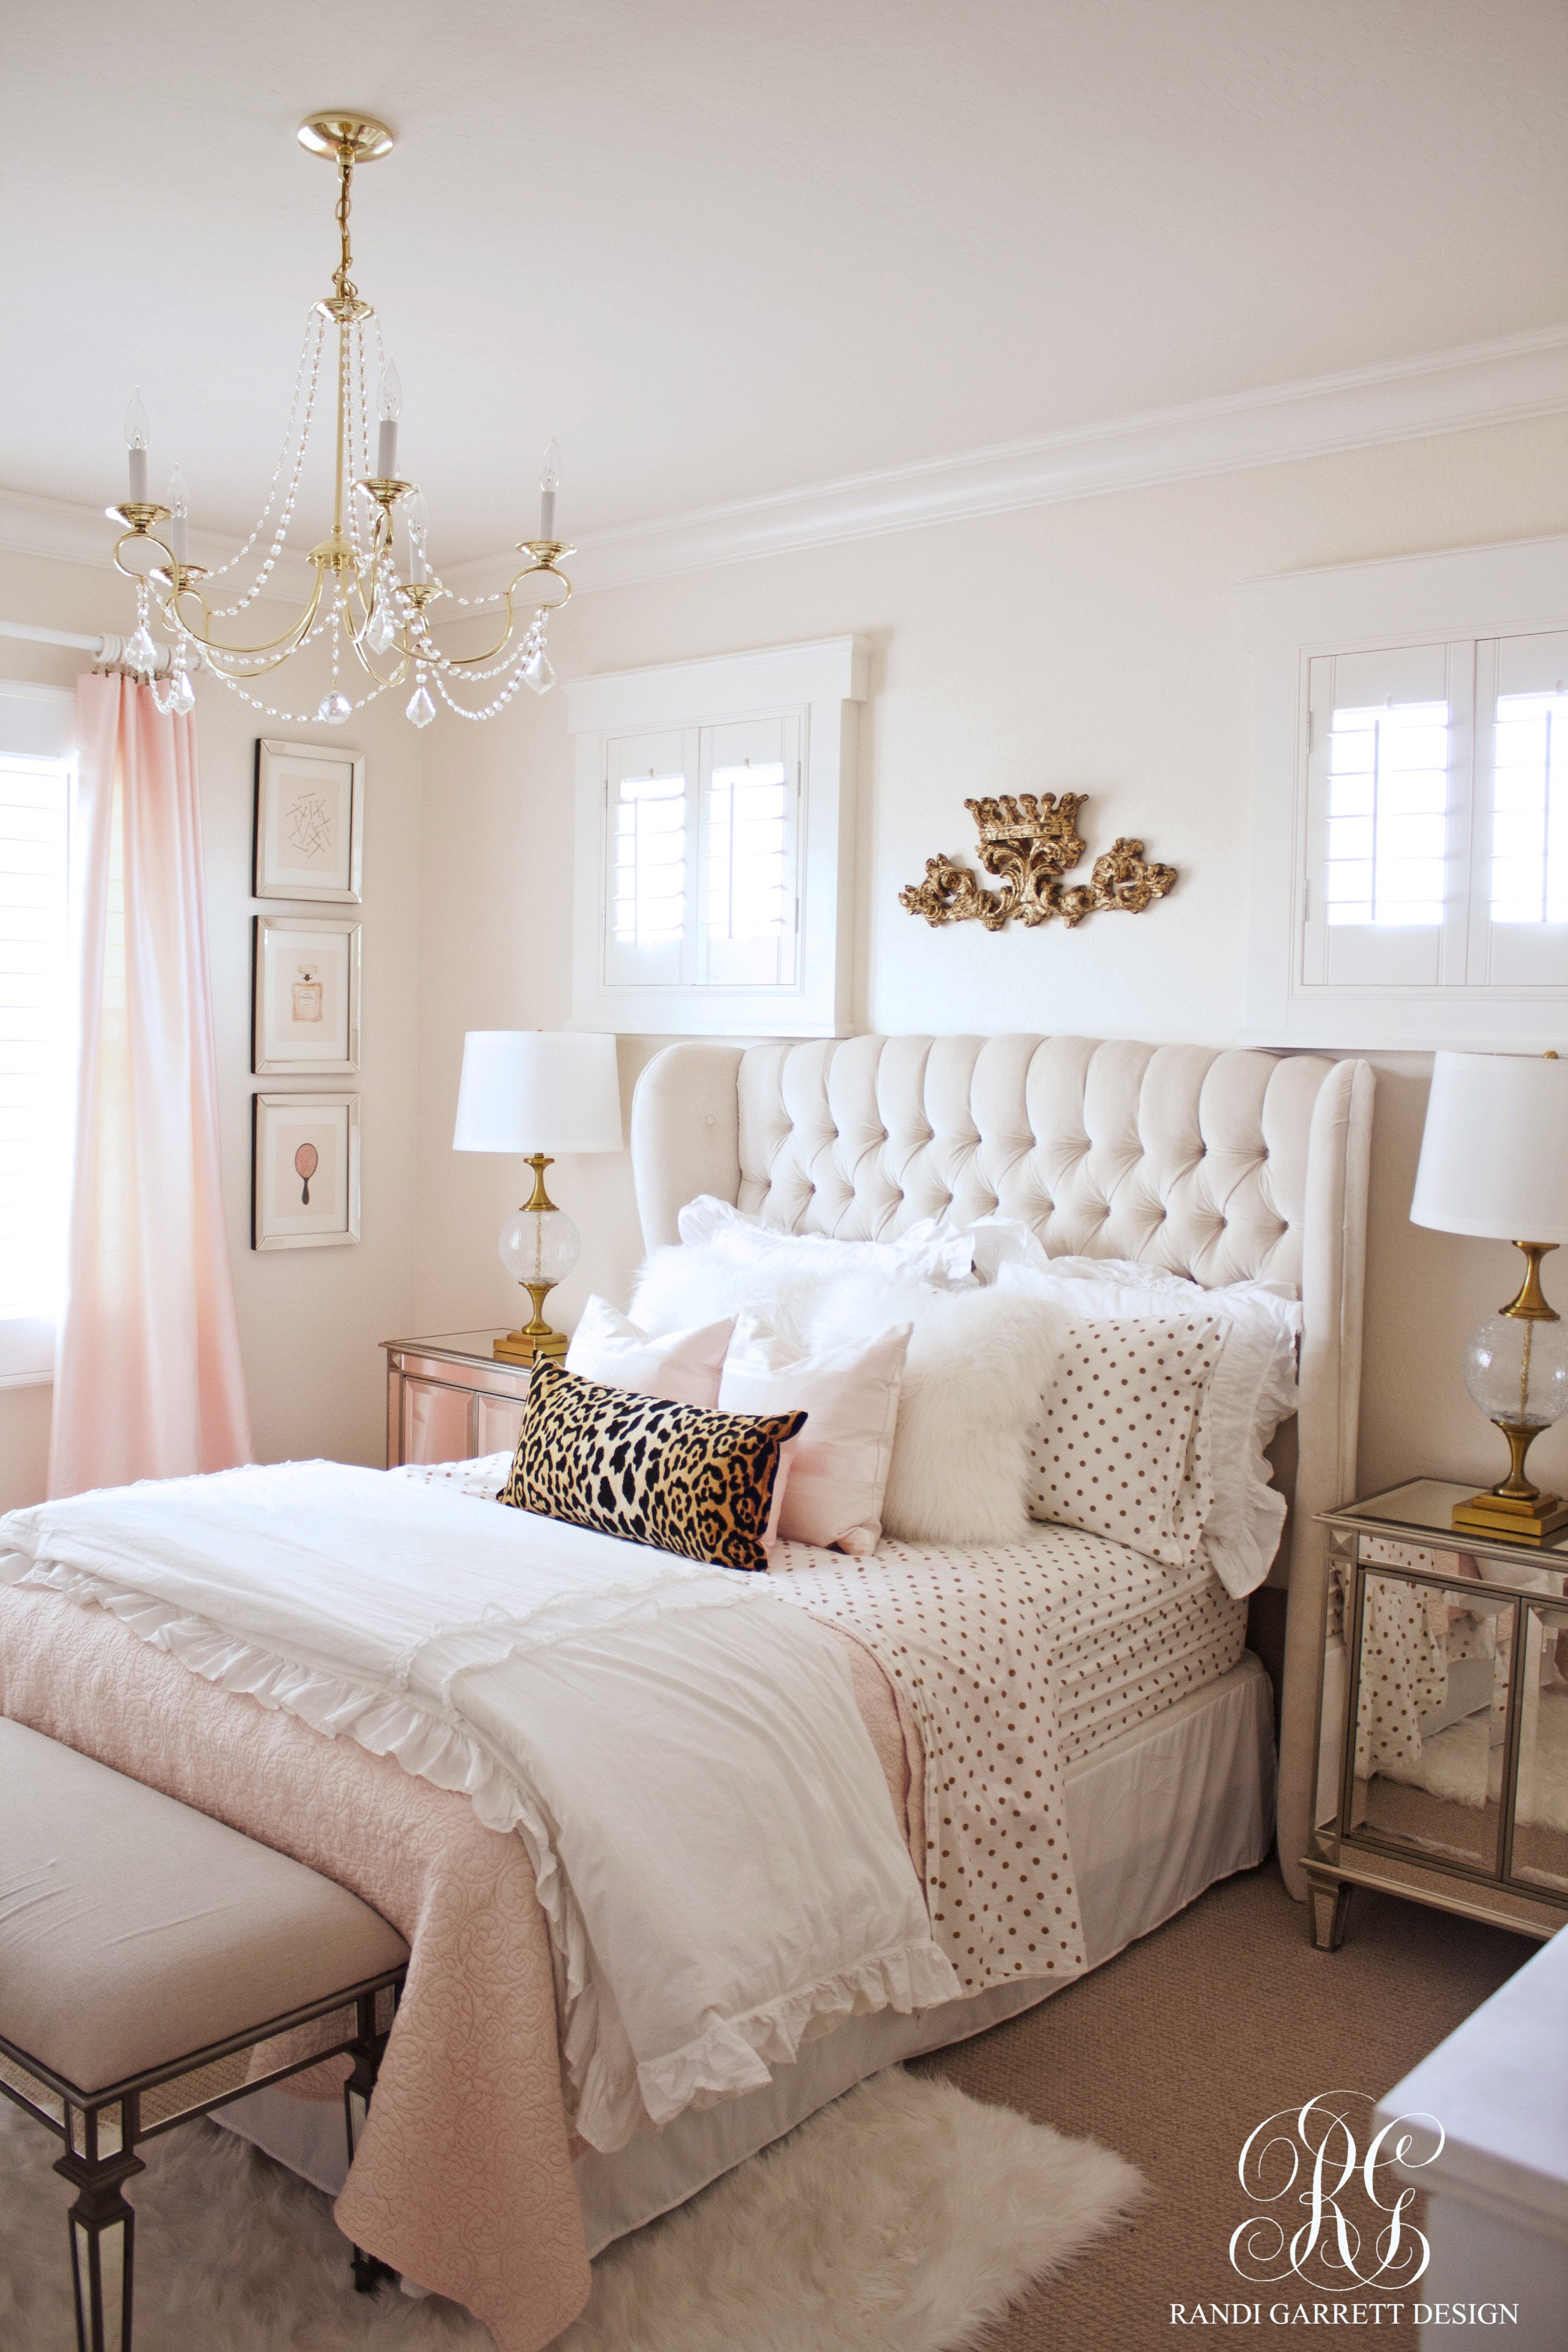 Teen Girl Bedroom Decor Unique Pink and Gold Girl S Bedroom Makeover Randi Garrett Design